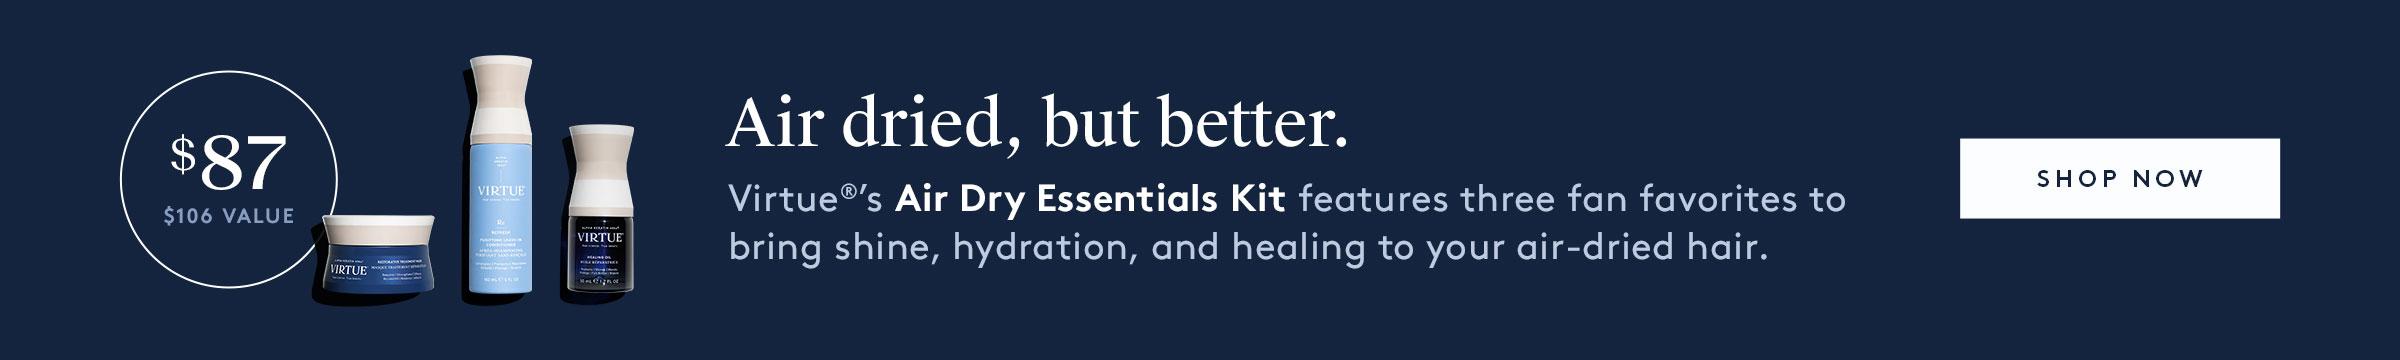 Air Dry Essentials Kit